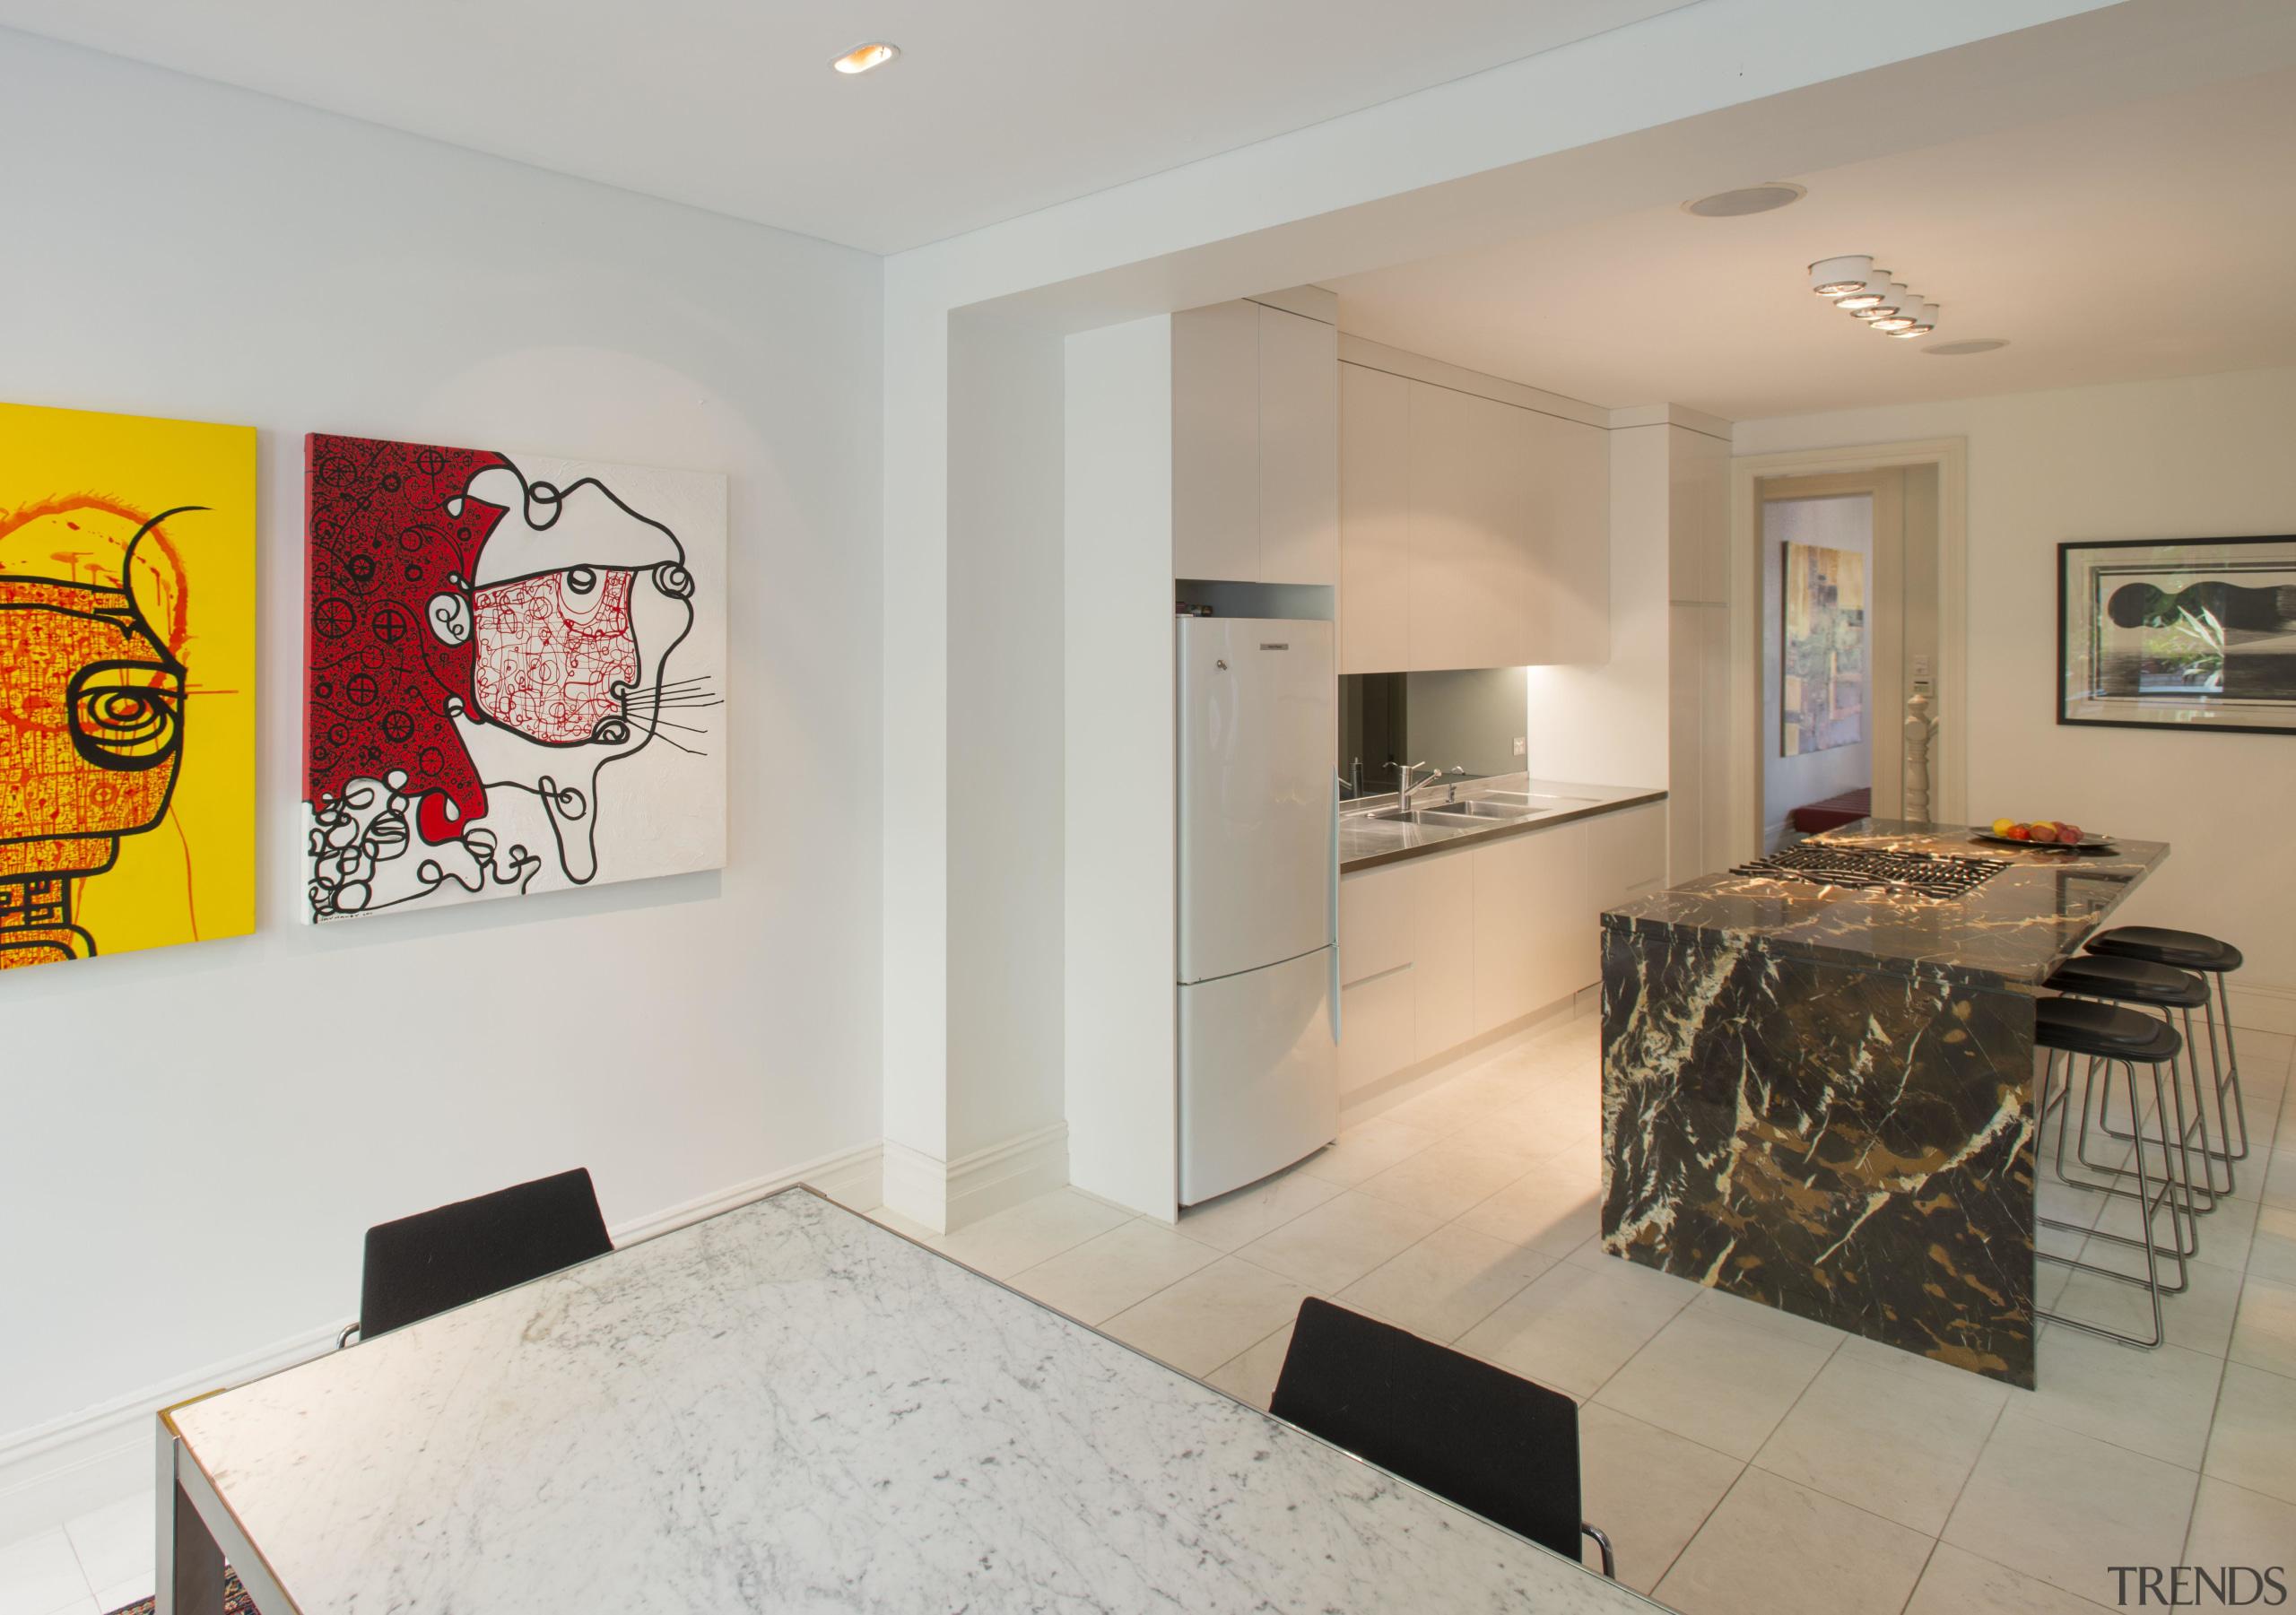 Resene interior paint - Resene interior paint - apartment, home, interior design, property, real estate, room, gray